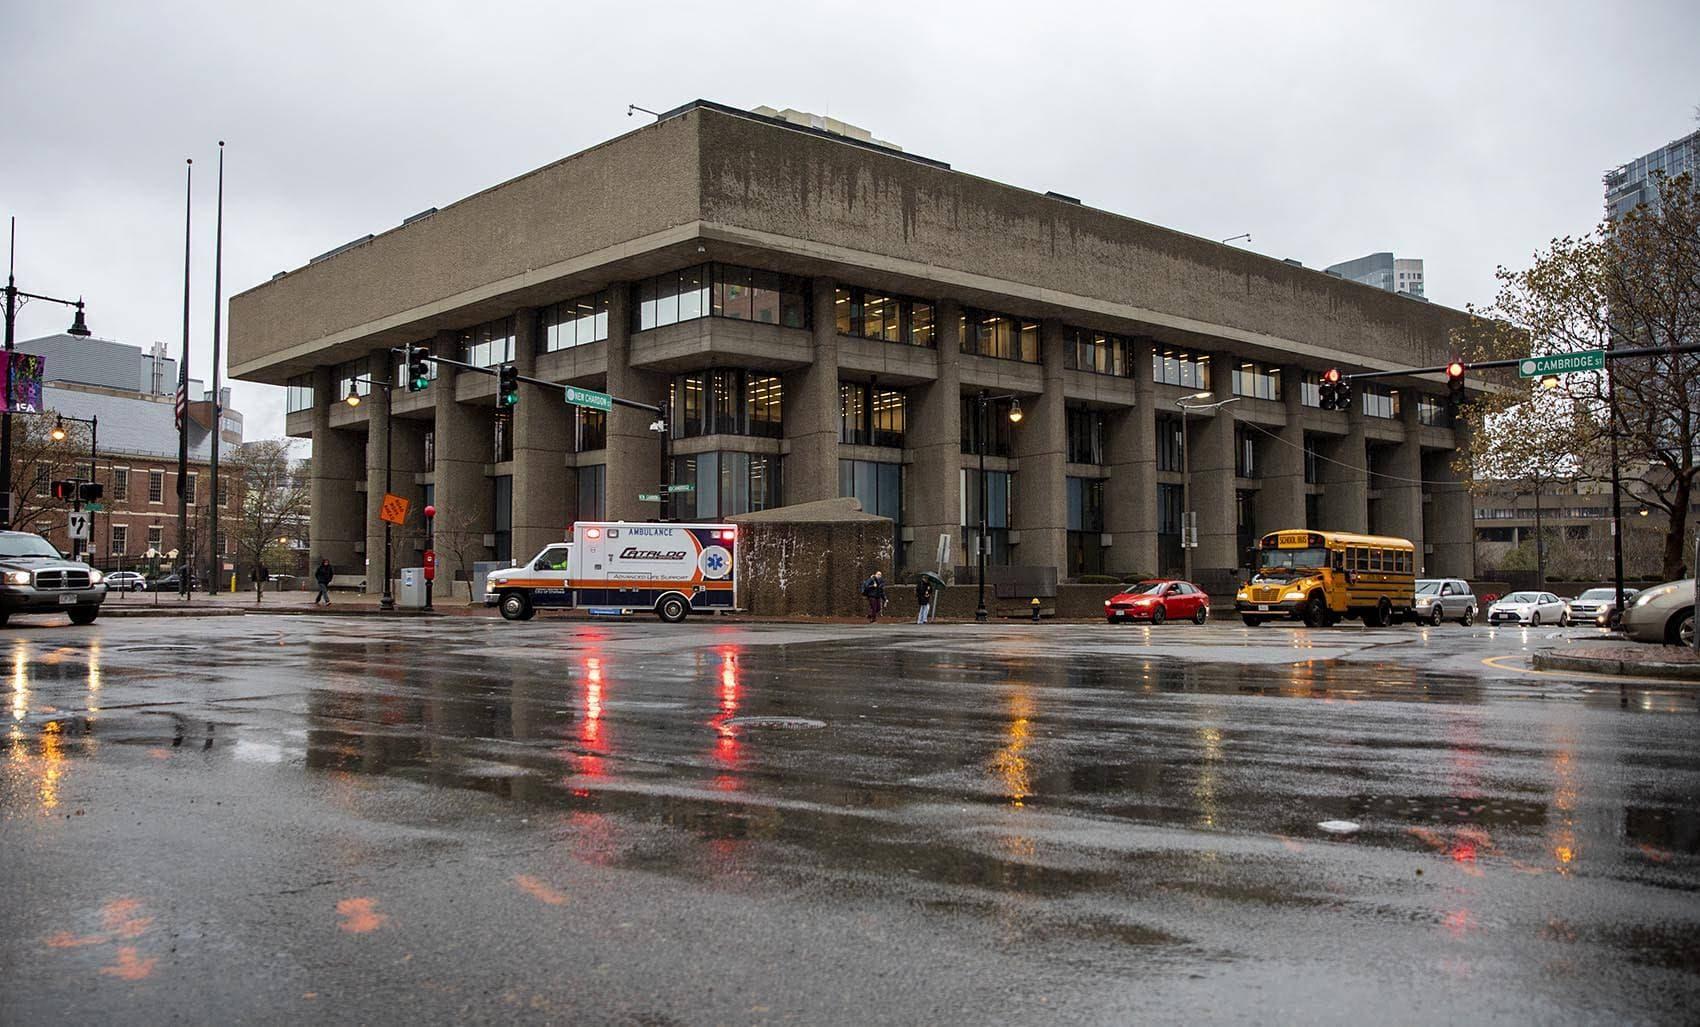 The Charles F. Hurley Building on the corner of Cambridge Street and New Chardon Street in Boston. (Robin Lubbock/WBUR)